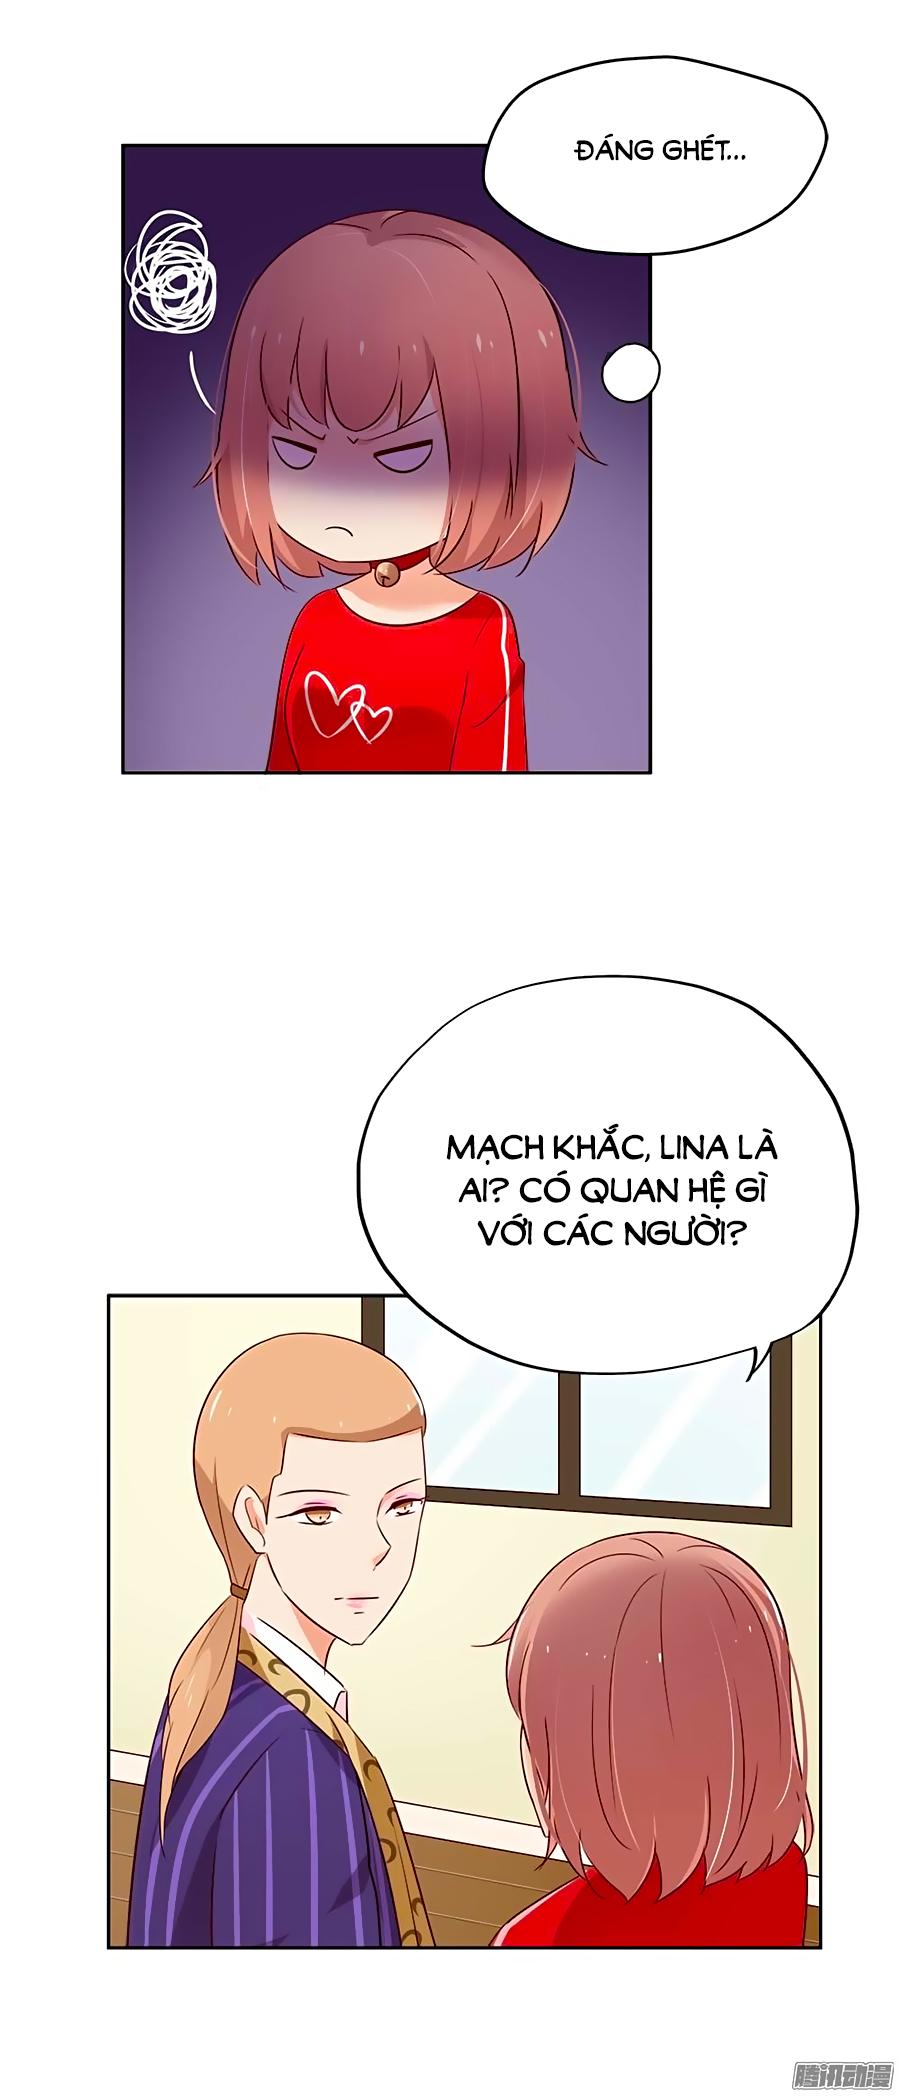 Bạn Trai Minh Tinh Bức Yêu Chap 13 - Next Chap 14